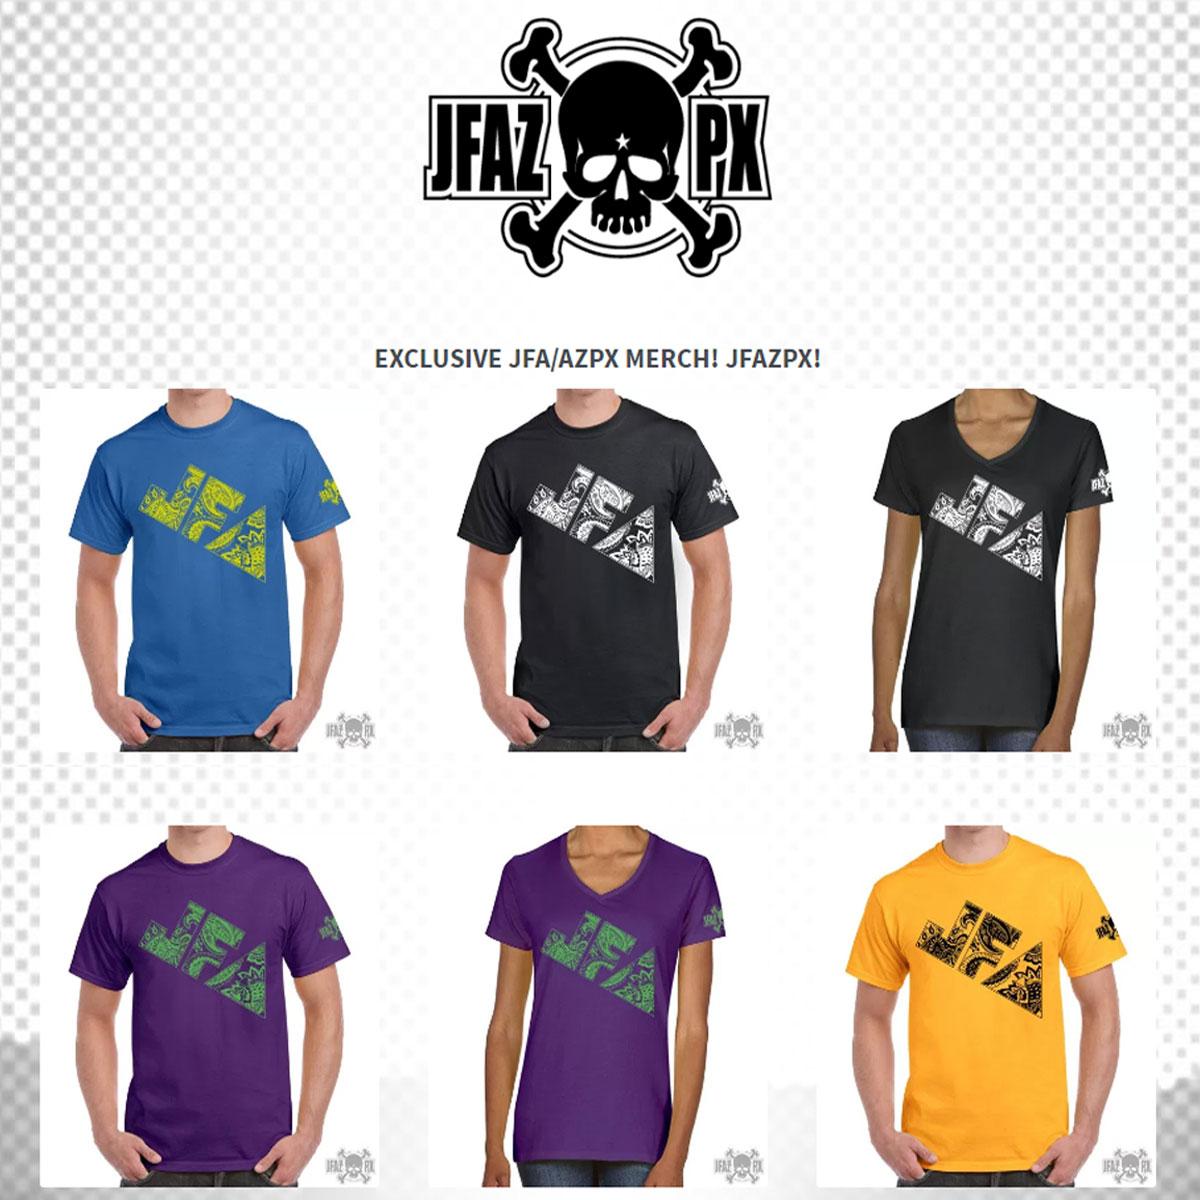 jfazpx-shirt-ad